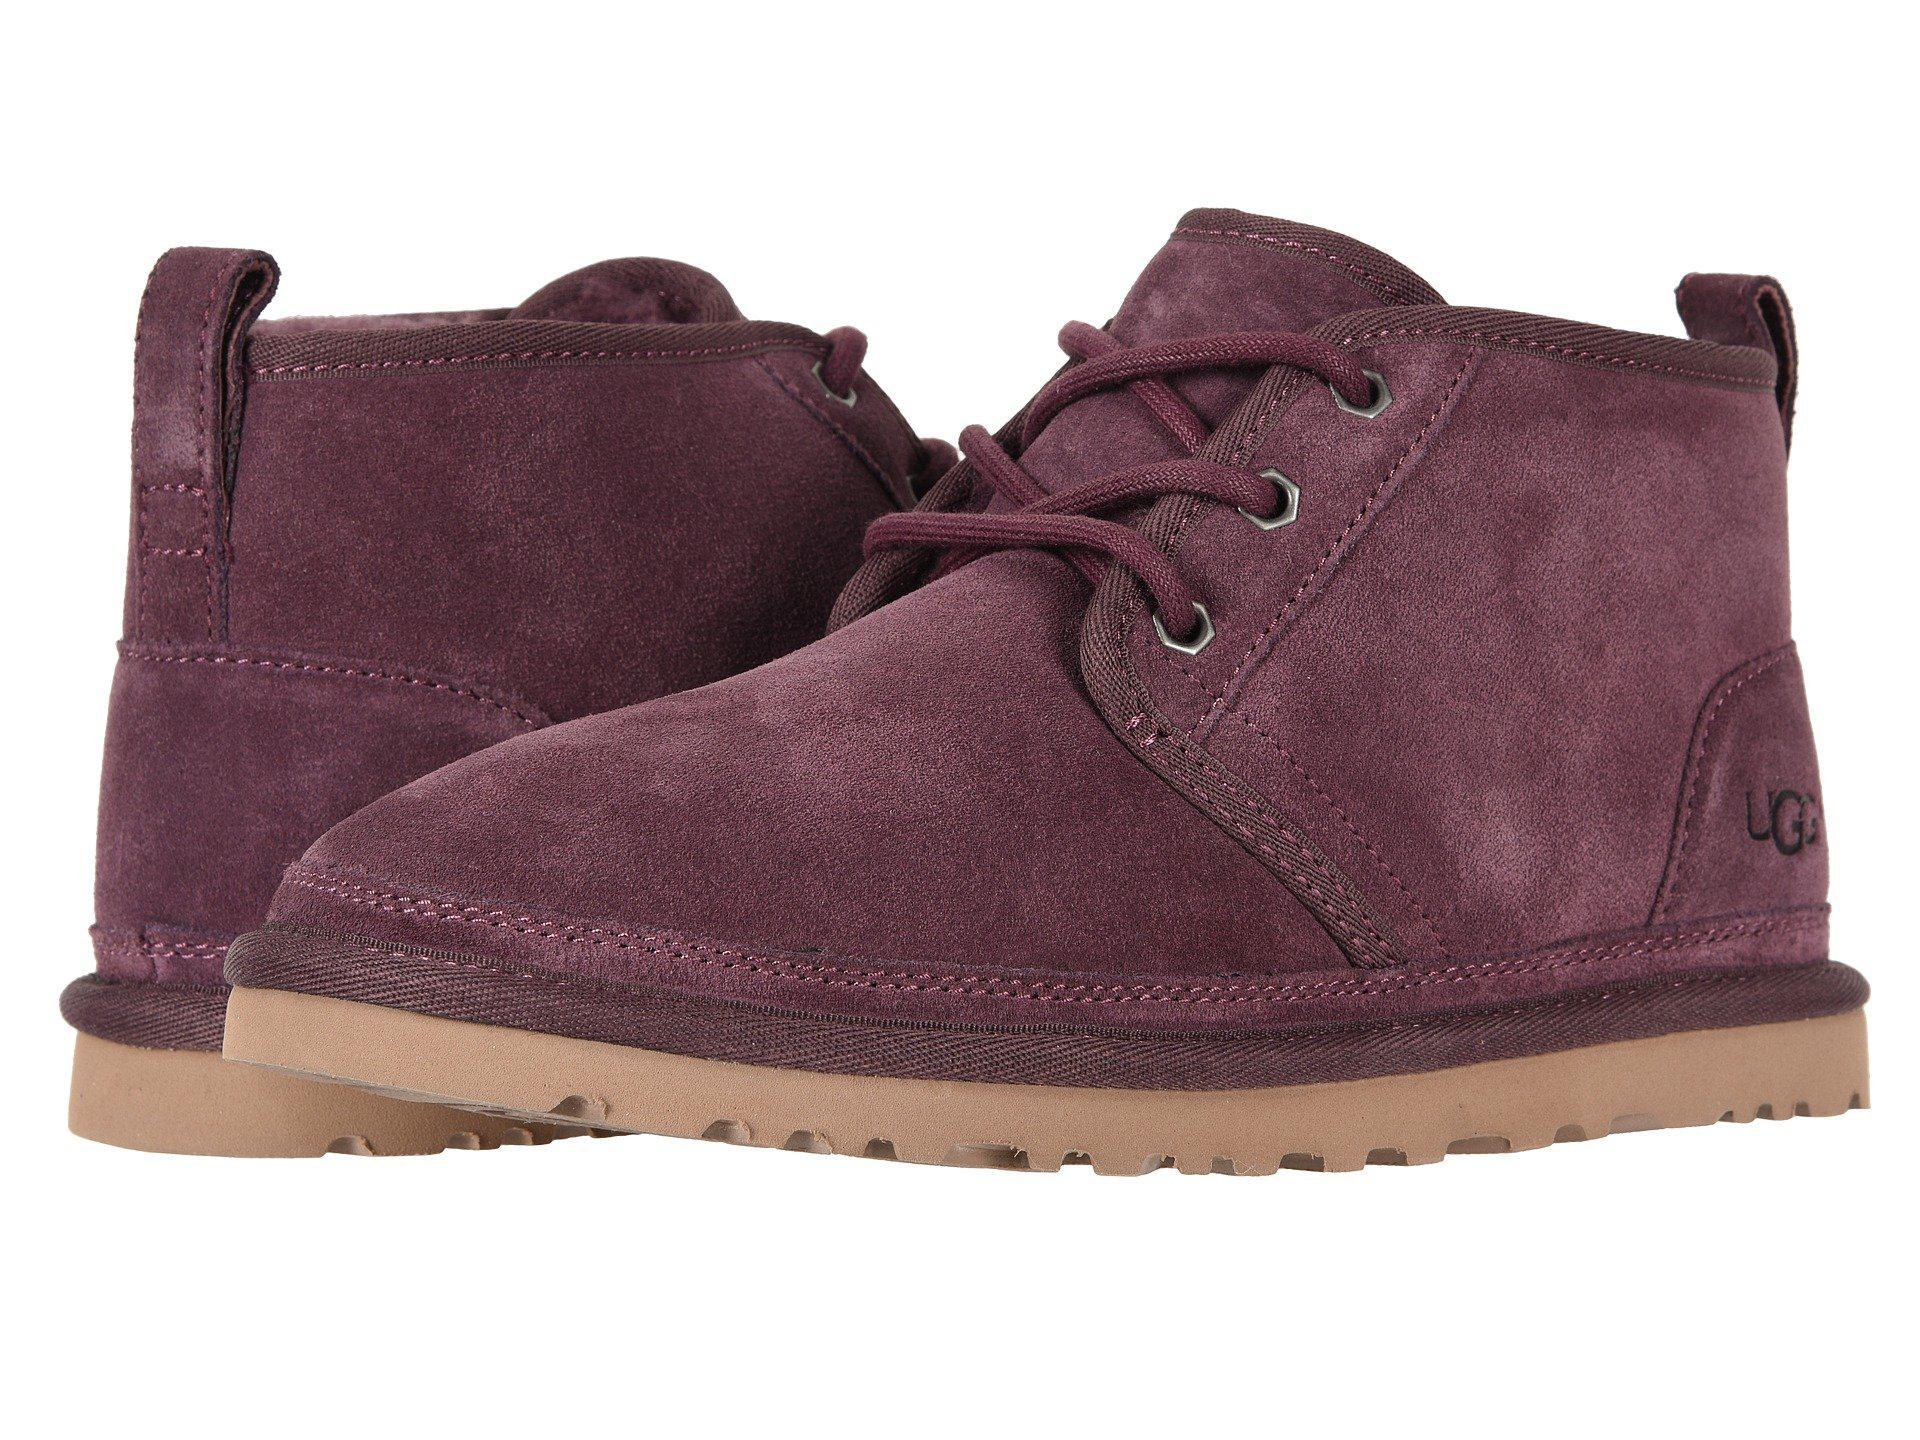 90d56f37b05 Ugg Purple Neumel (port) Women's Lace Up Casual Shoes